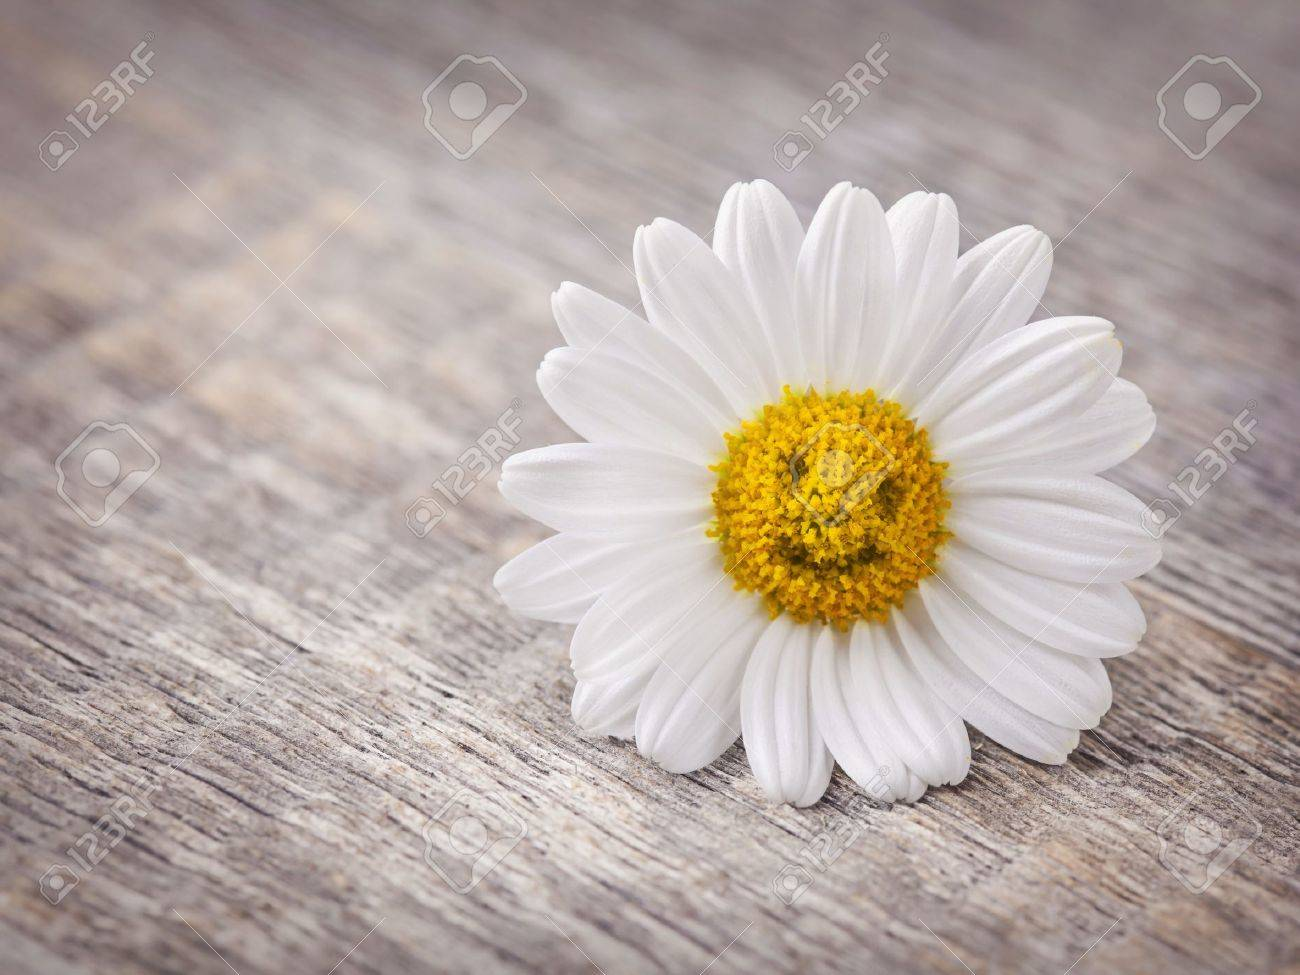 Chamomile flower on wooden background - 19134933